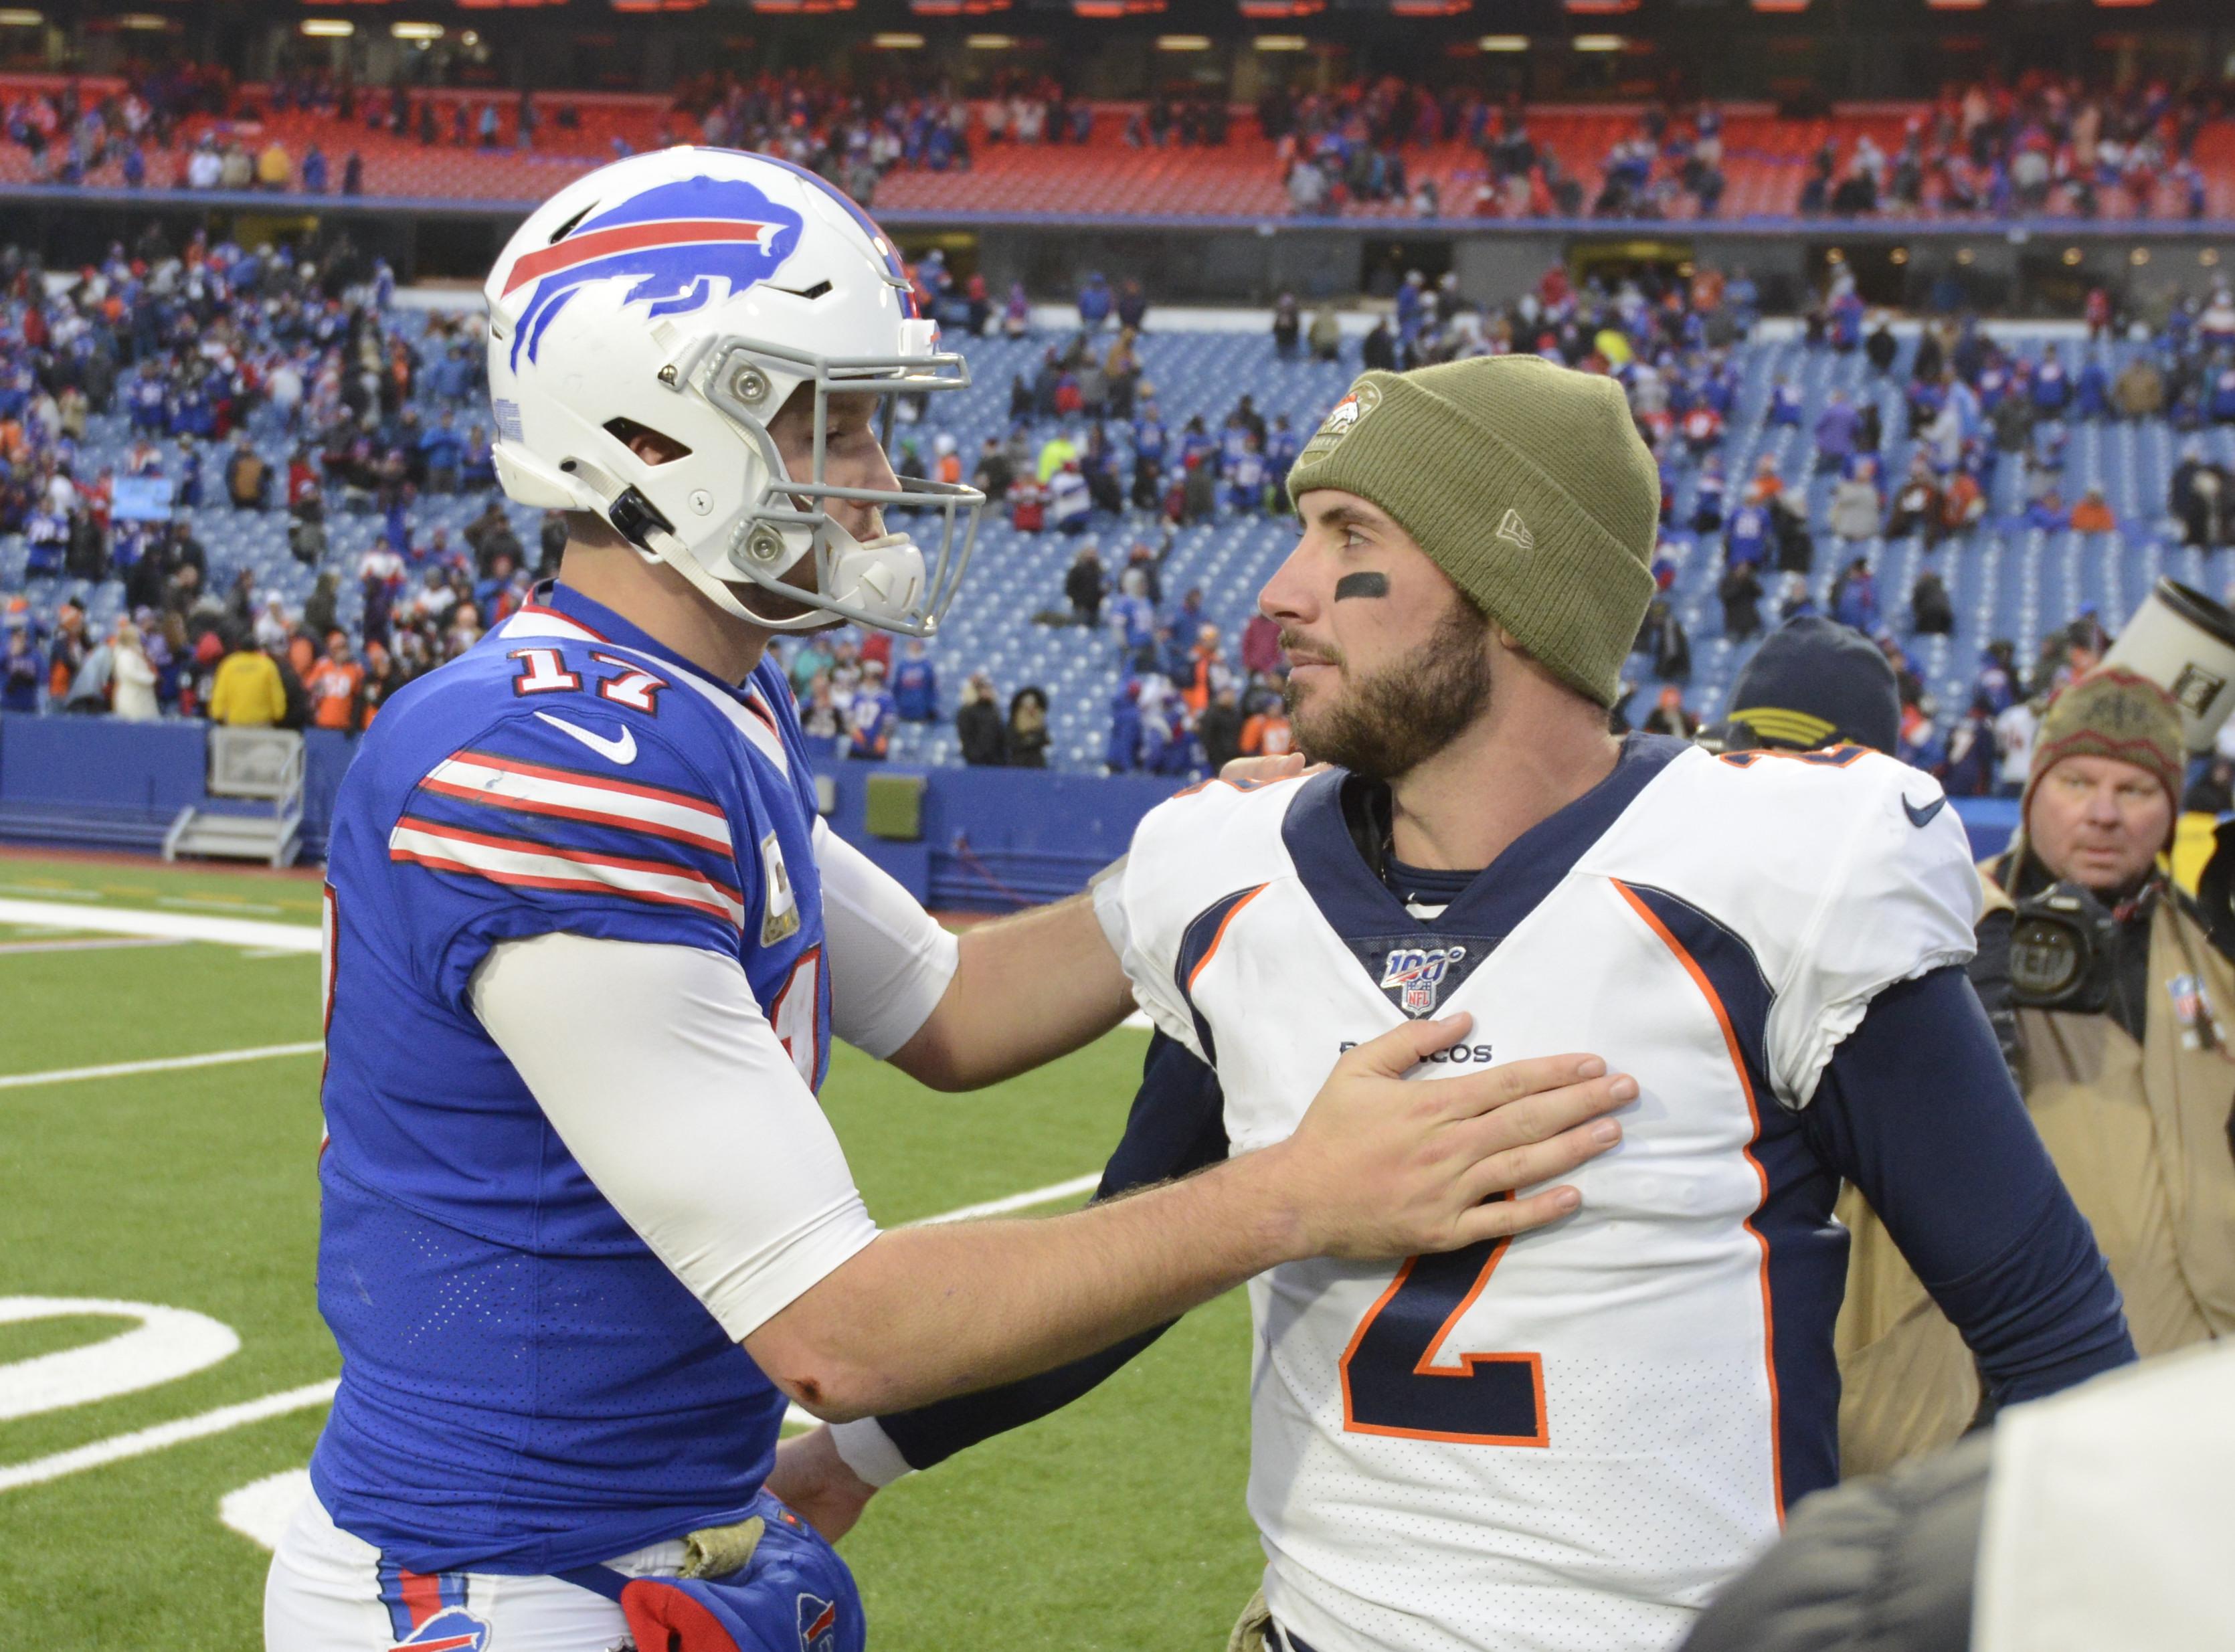 NFL: Denver Broncos at Buffalo Bills